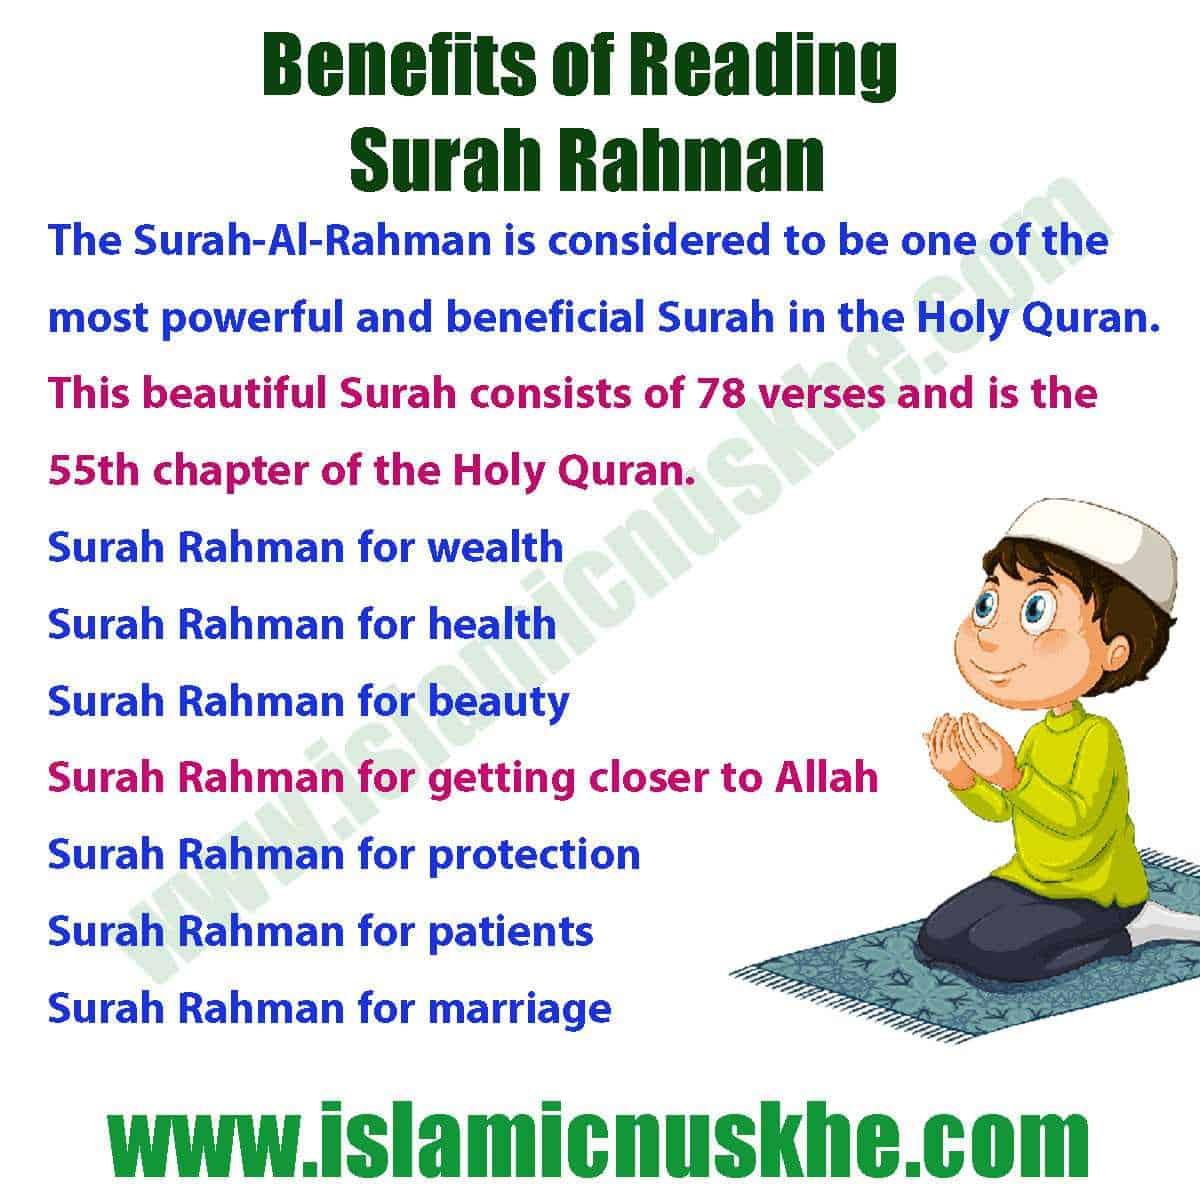 Here is Benefits of Reading Surah Rahman